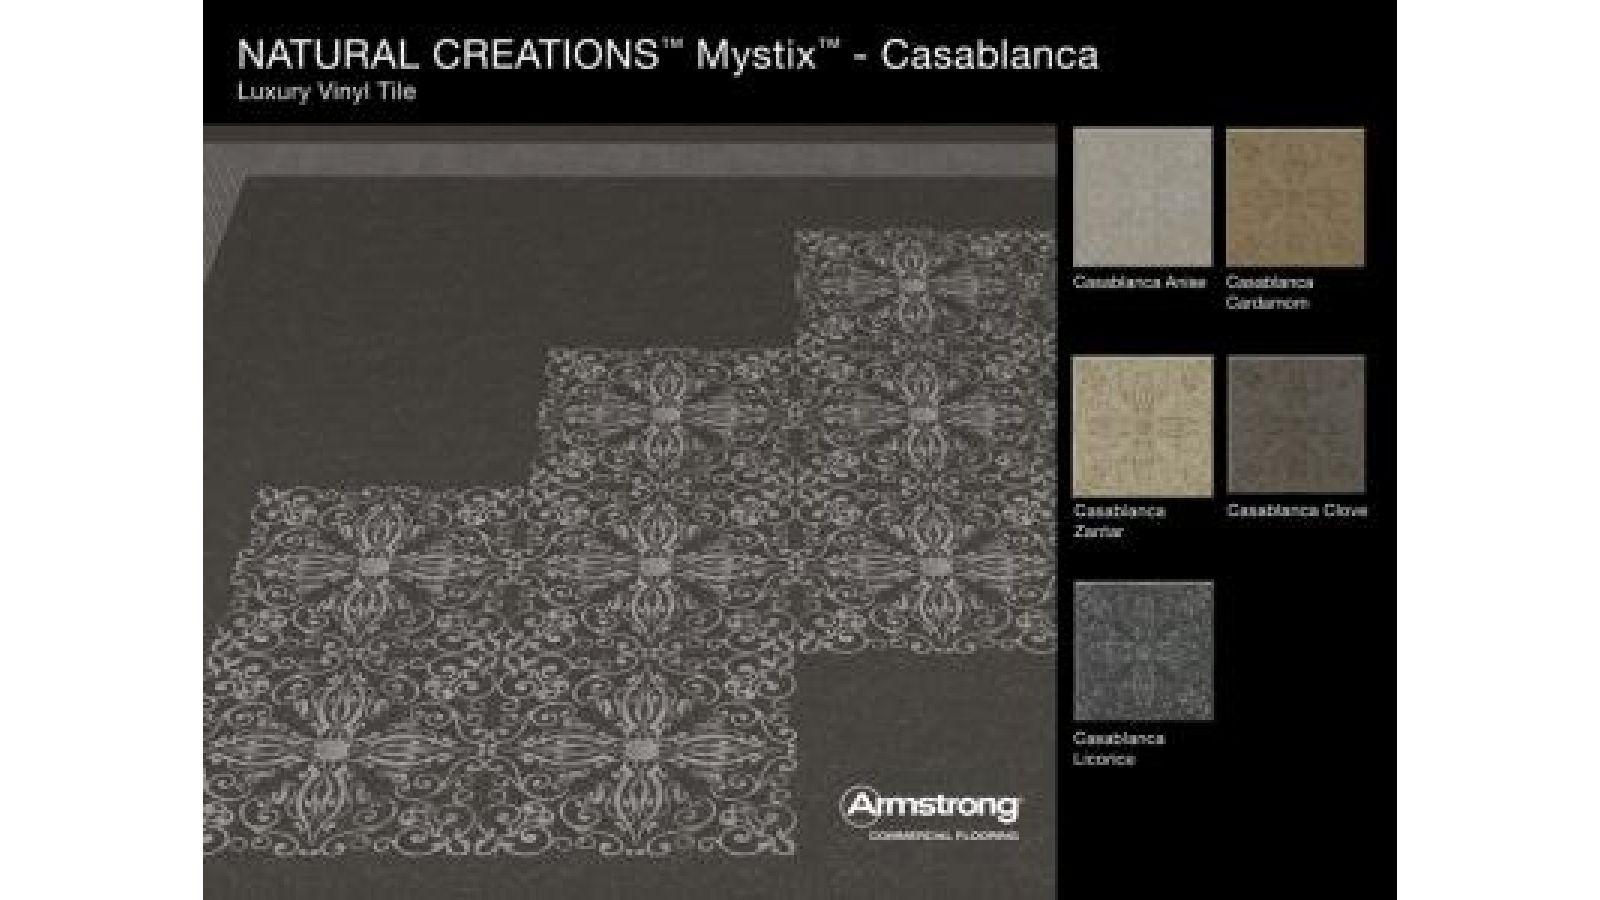 NaturalCreations Casablanca